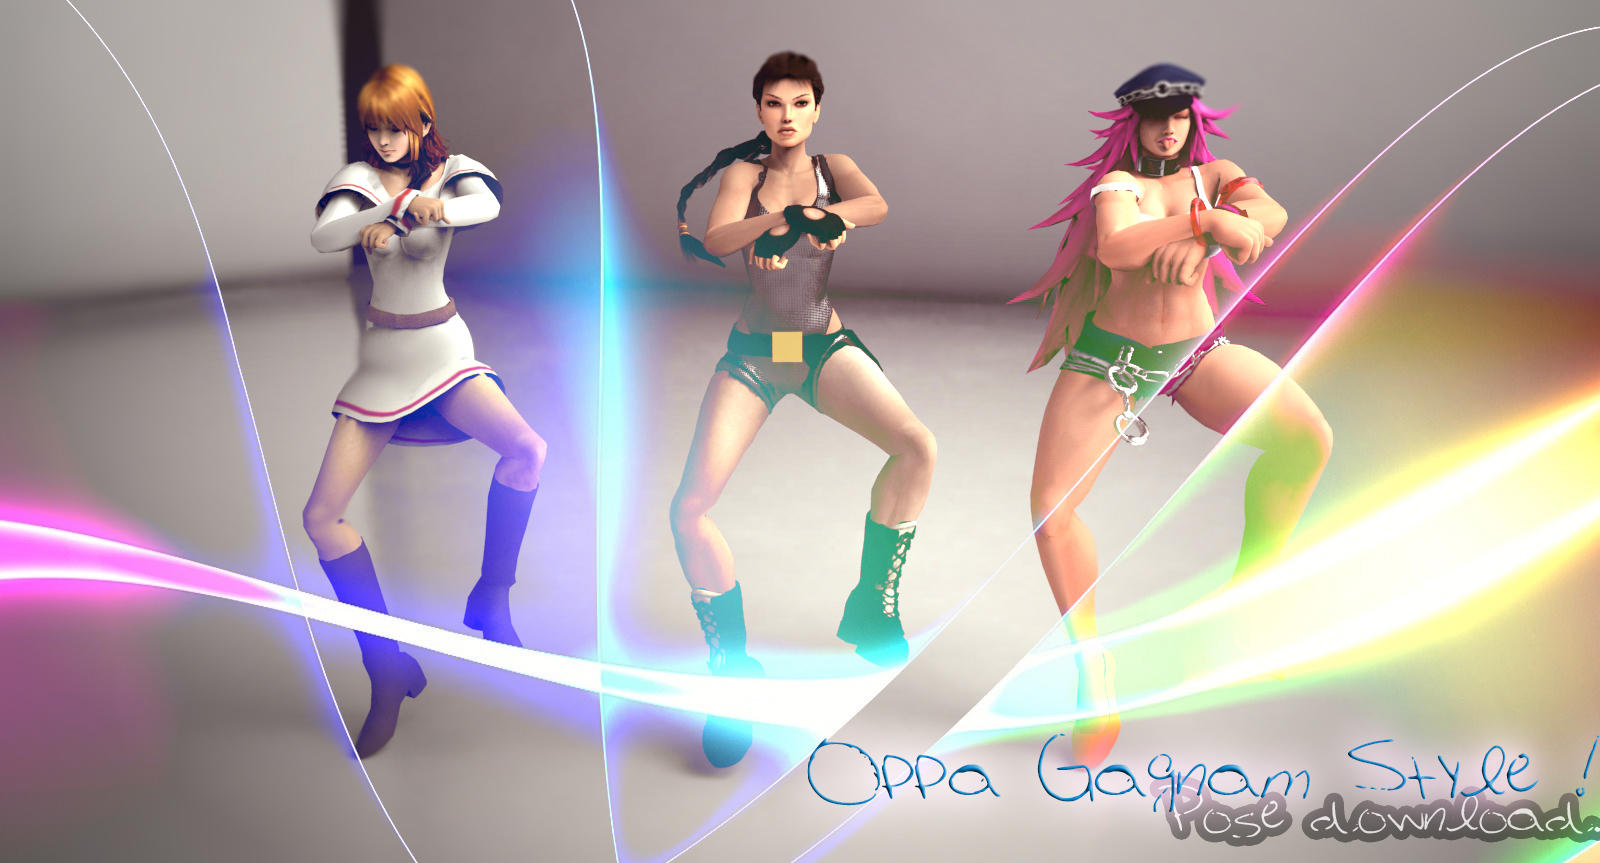 XNALara Pose DL - Oppa Gagnam Style Dance by Kukla-Factory